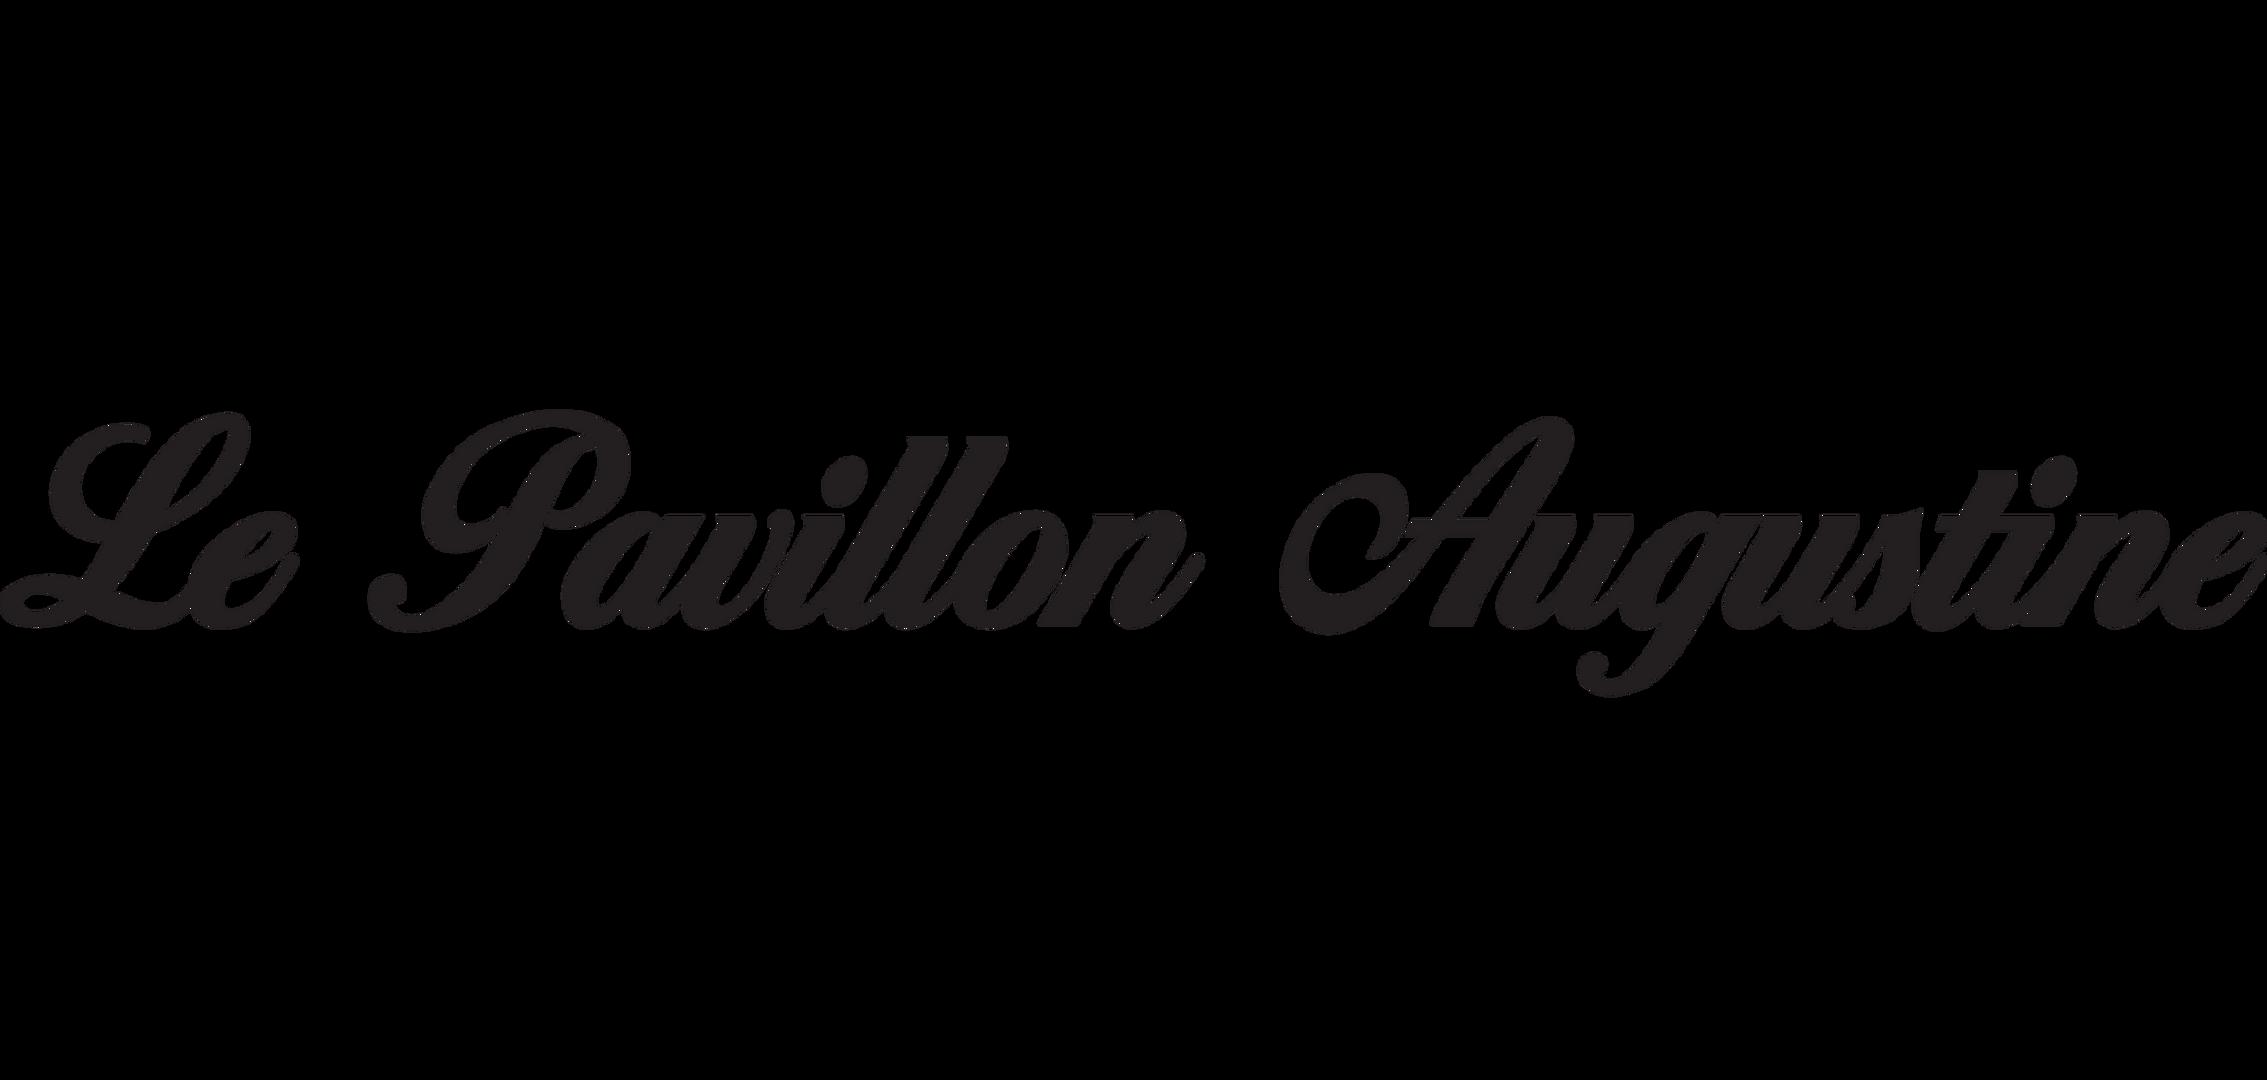 pavillon augustin.png